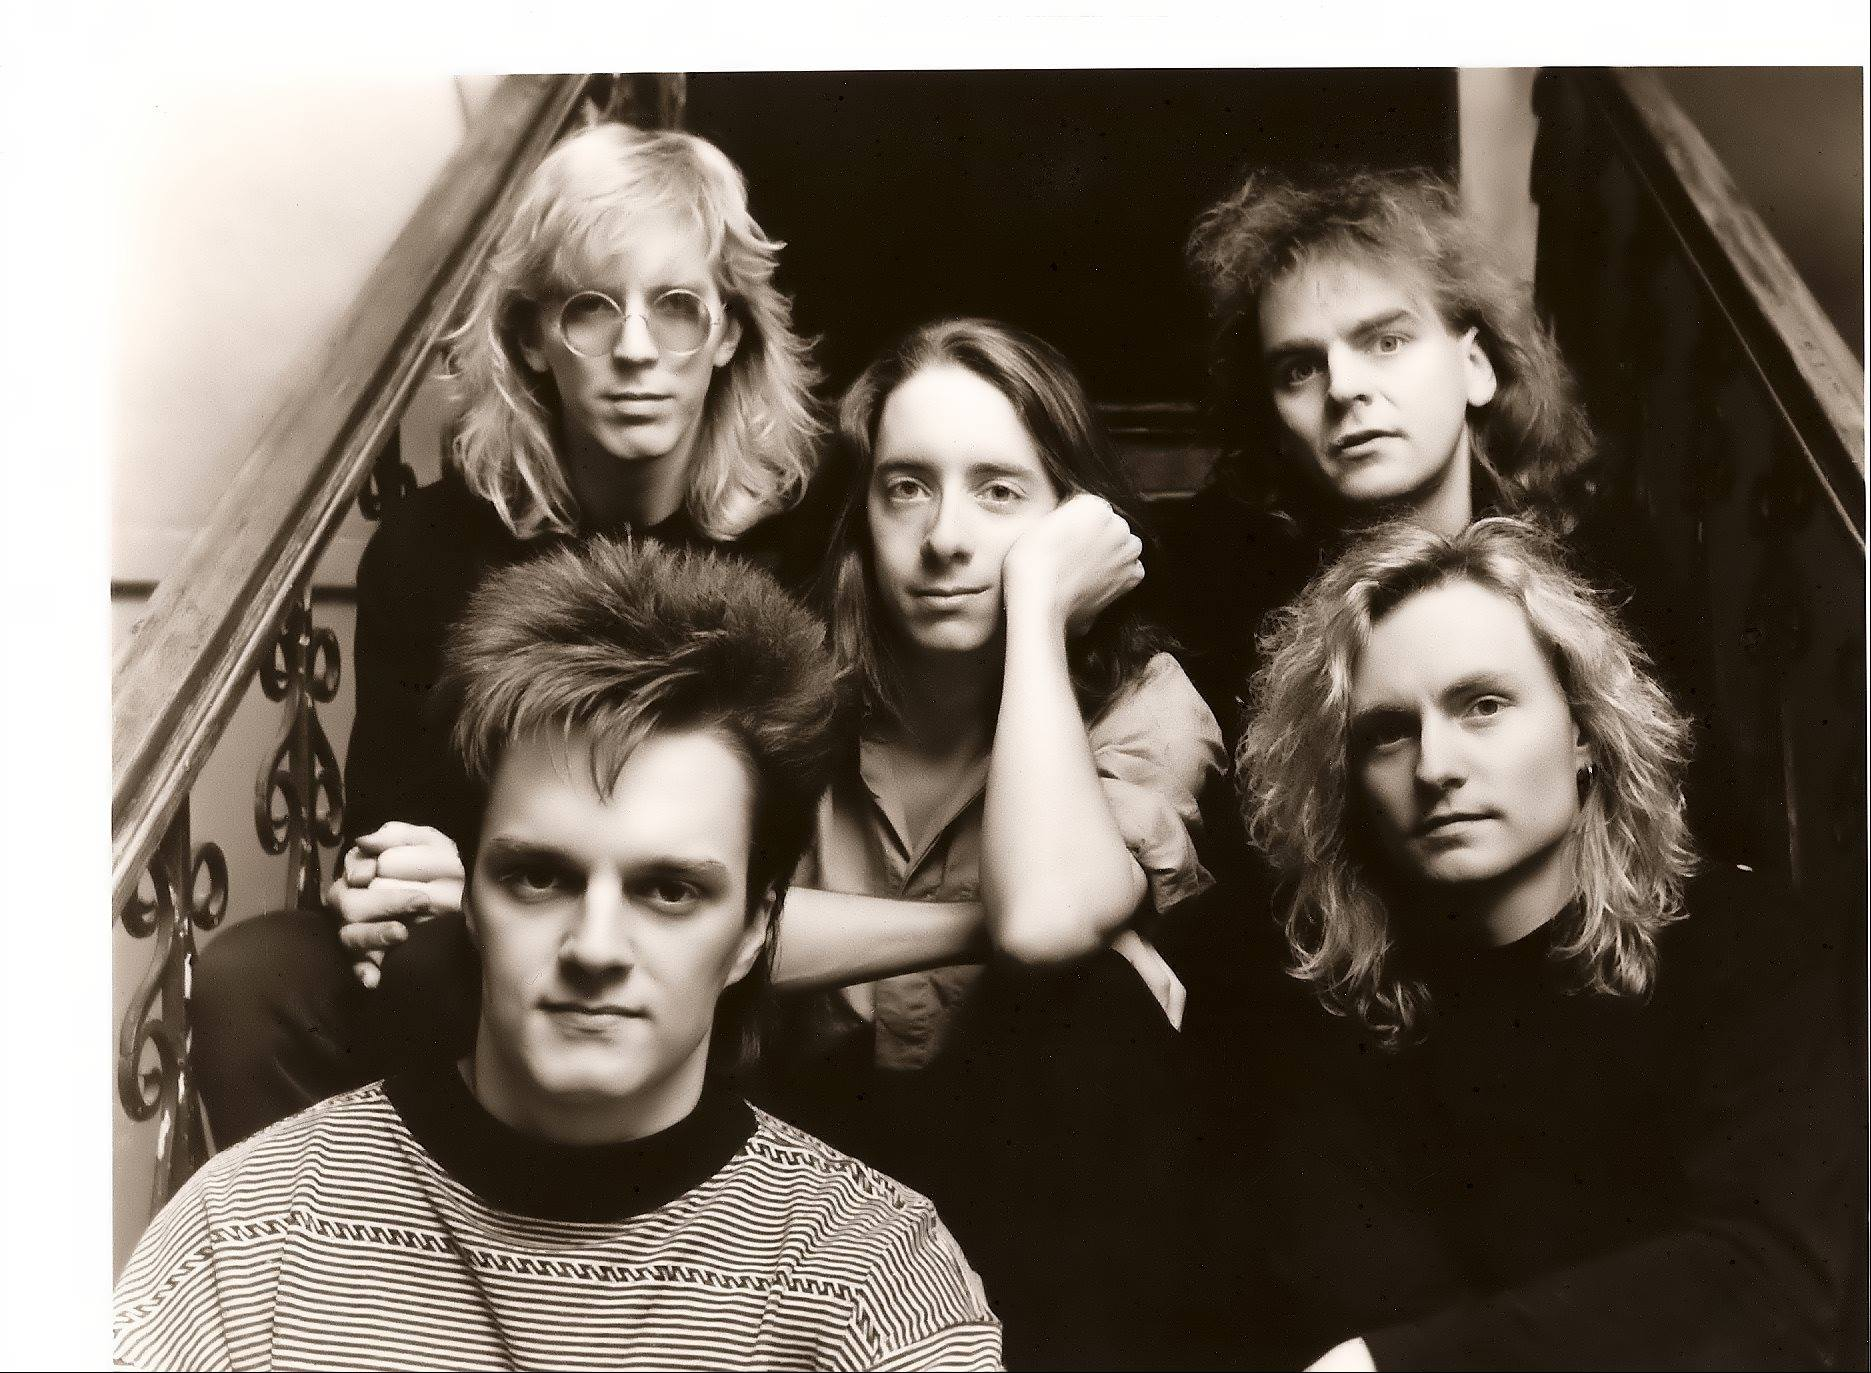 Human Radio promo, '89